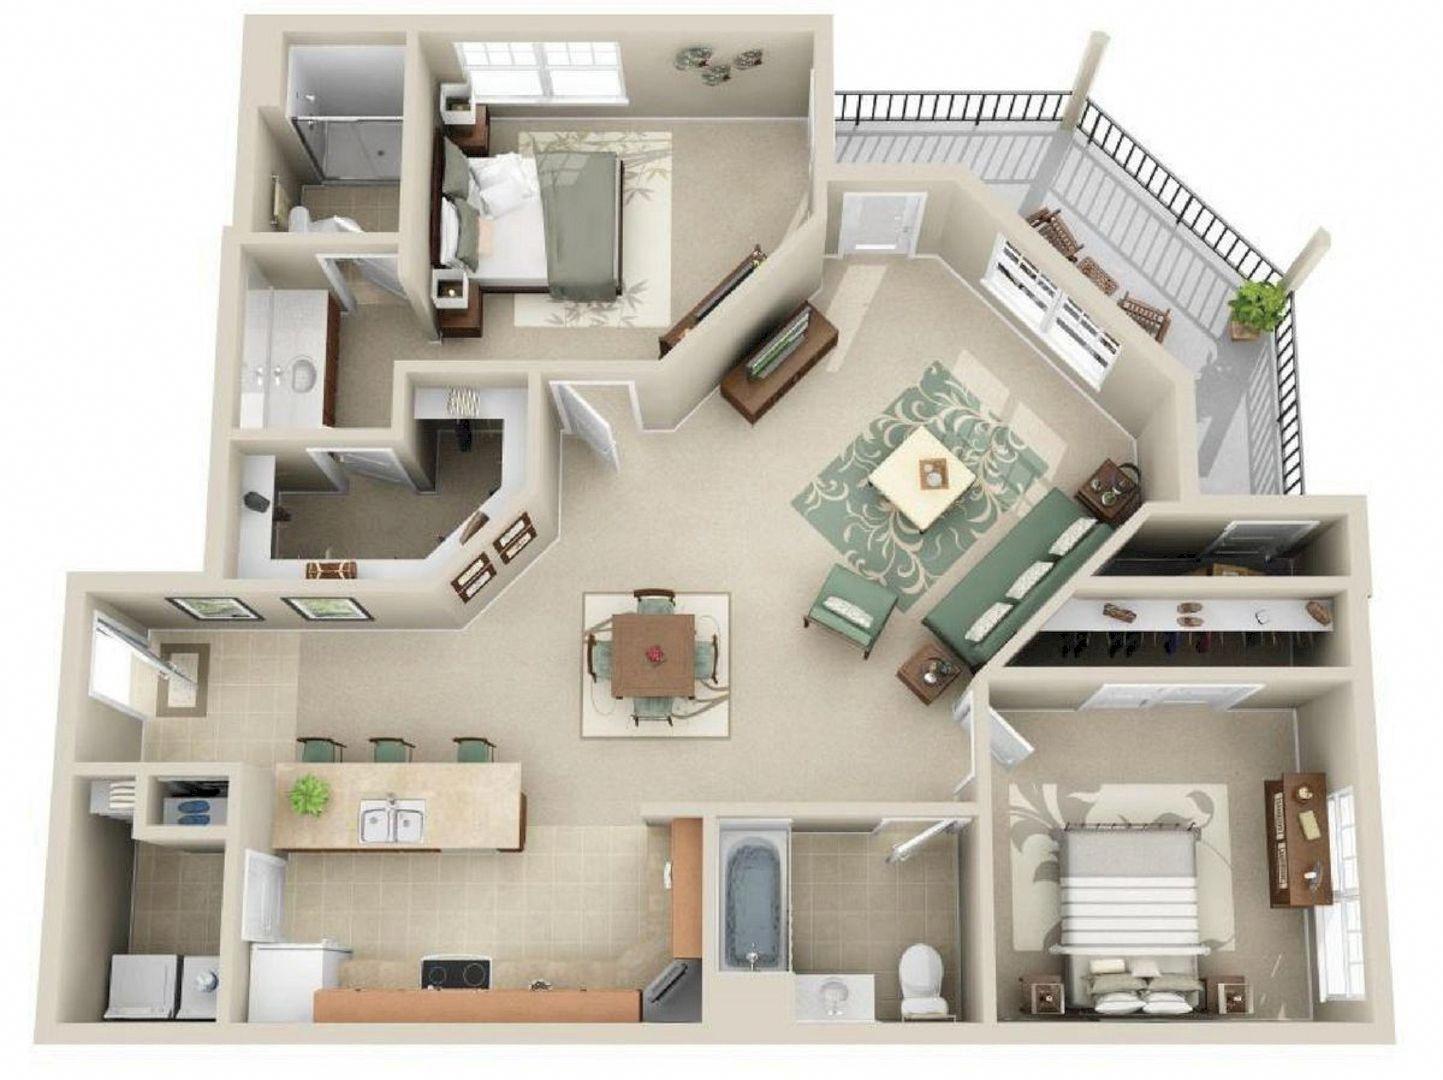 Houseinteriors 3d House Plans Sims 4 House Plans Sims House Plans